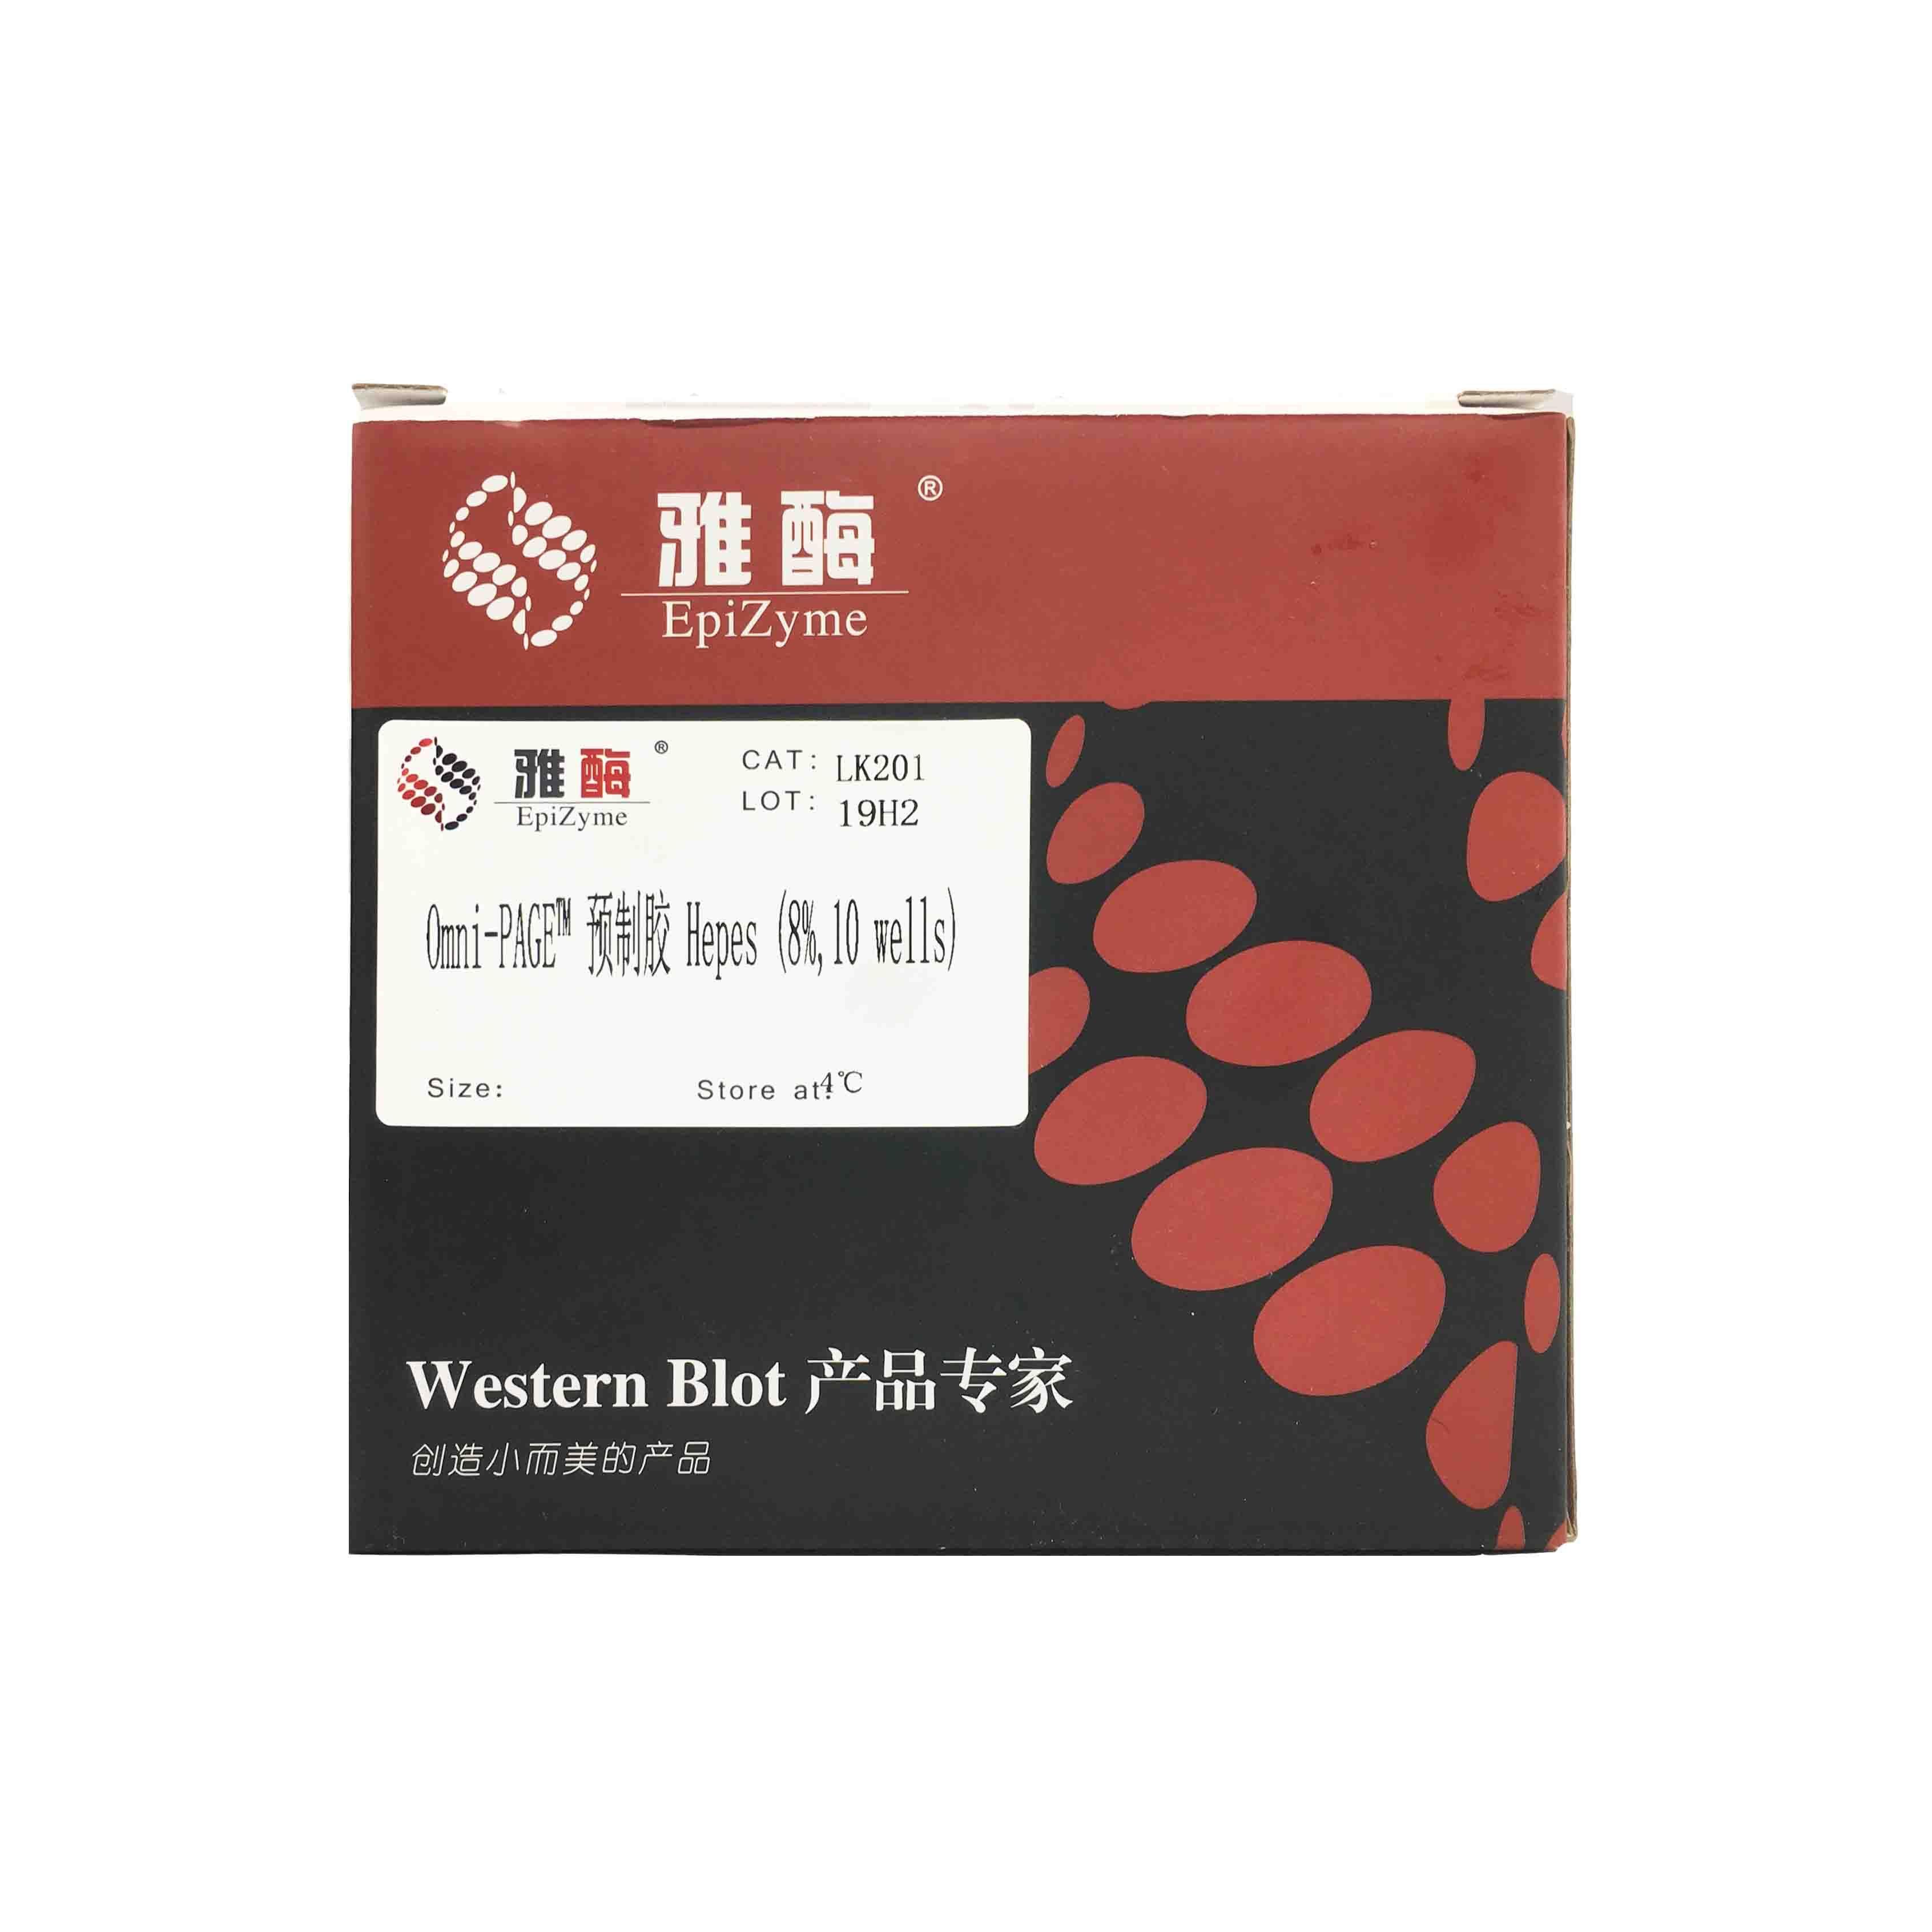 LK201 Omni-PAGE™ 预制胶 Hepes 8%,10 wells